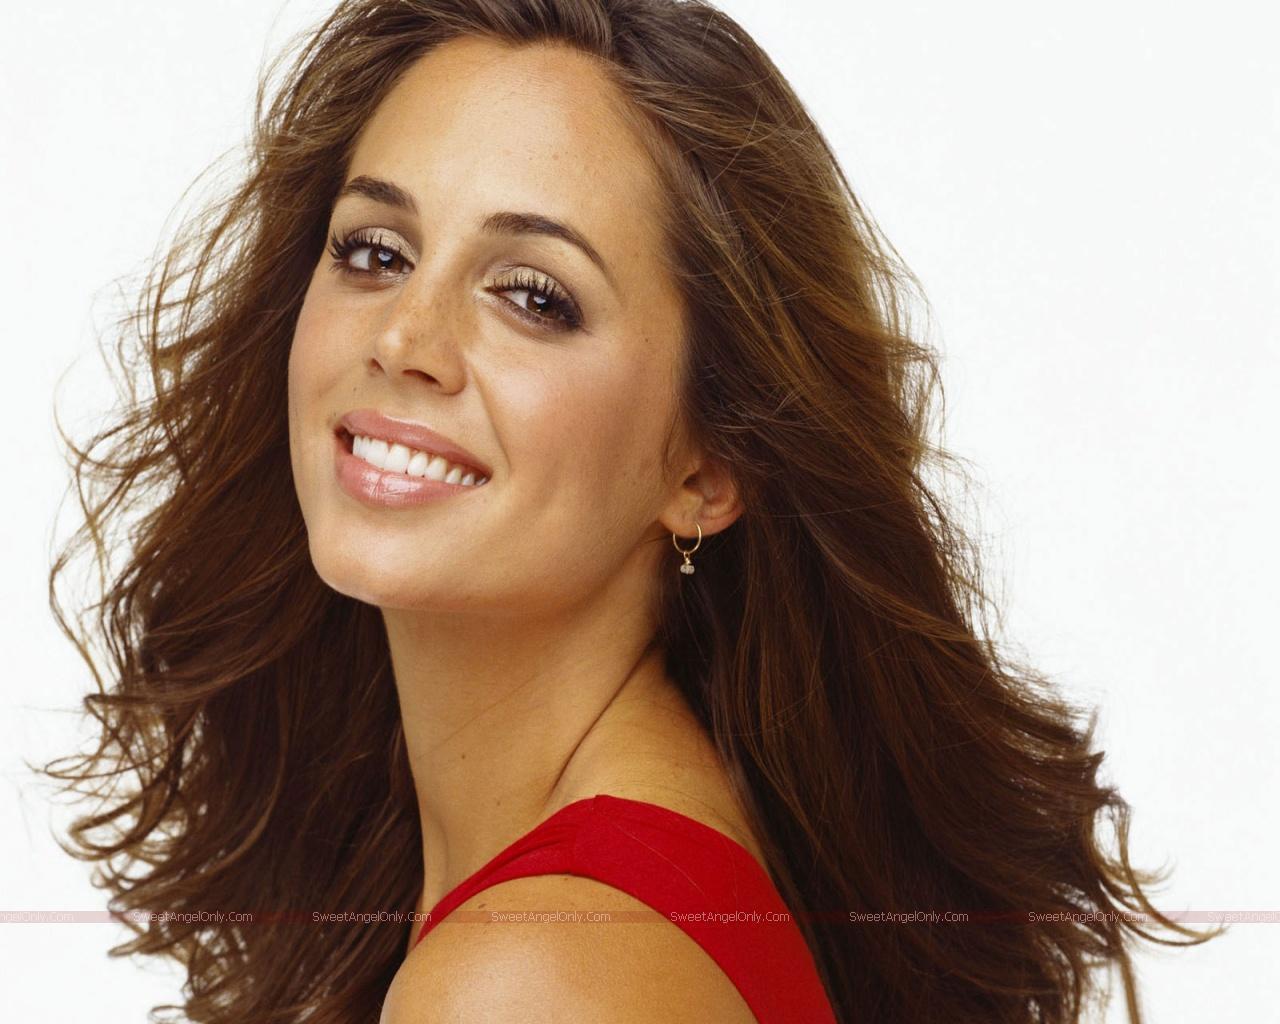 http://1.bp.blogspot.com/-jmCTWDqihgE/TWO1zm19dtI/AAAAAAAAEnc/tXn0nYUnYb4/s1600/eliza_dushku_hot_actress_wallpapers_07.jpg